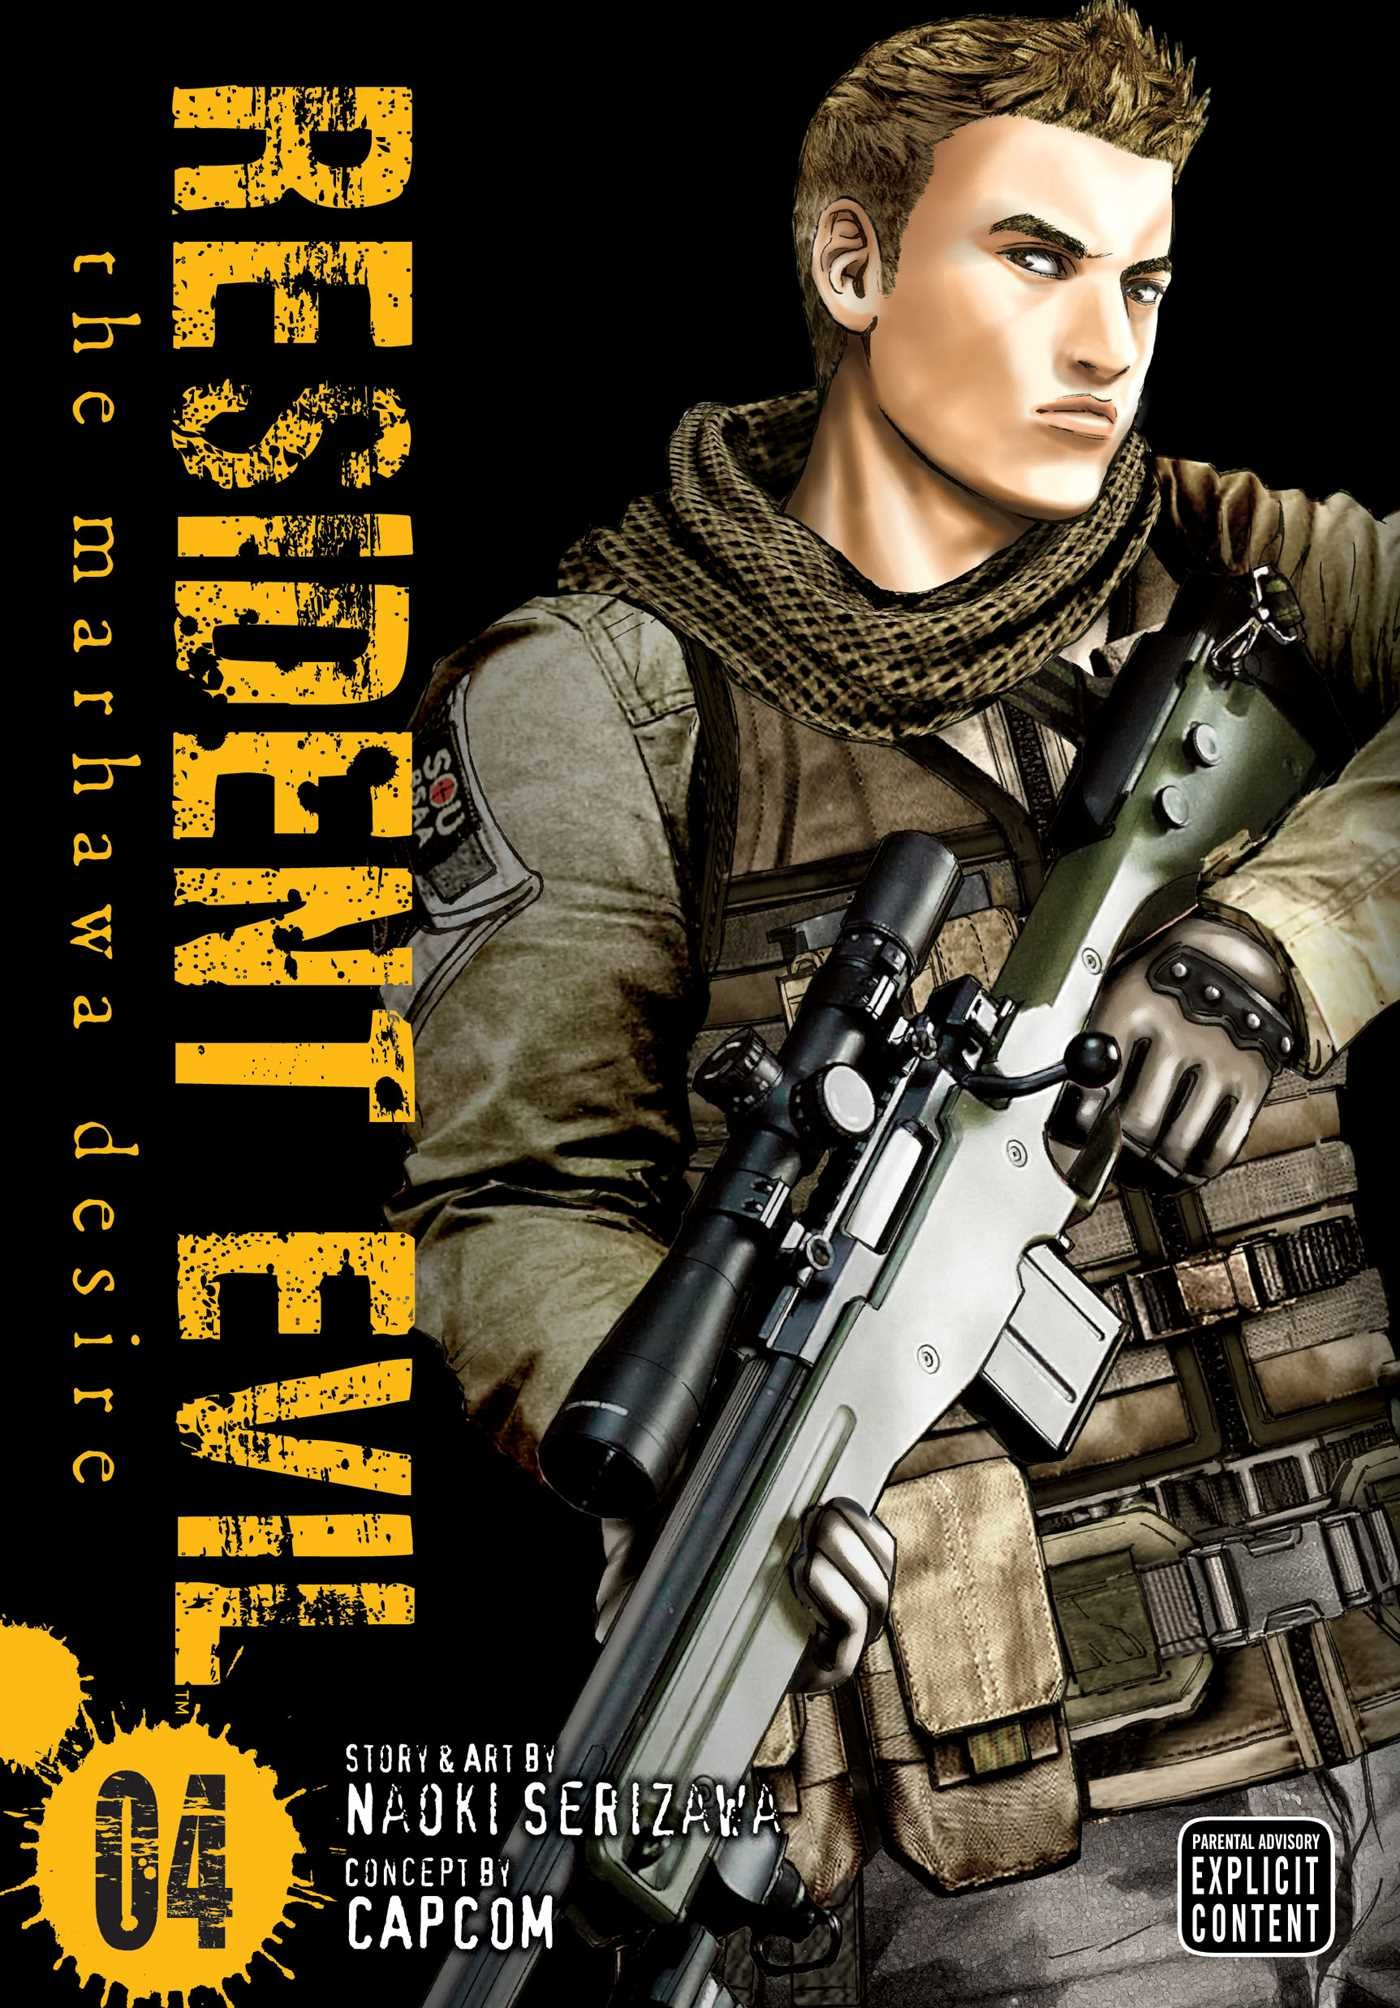 Resident Evil Biohazard Marhawa desire chapter 27: kén nhộng trang 1